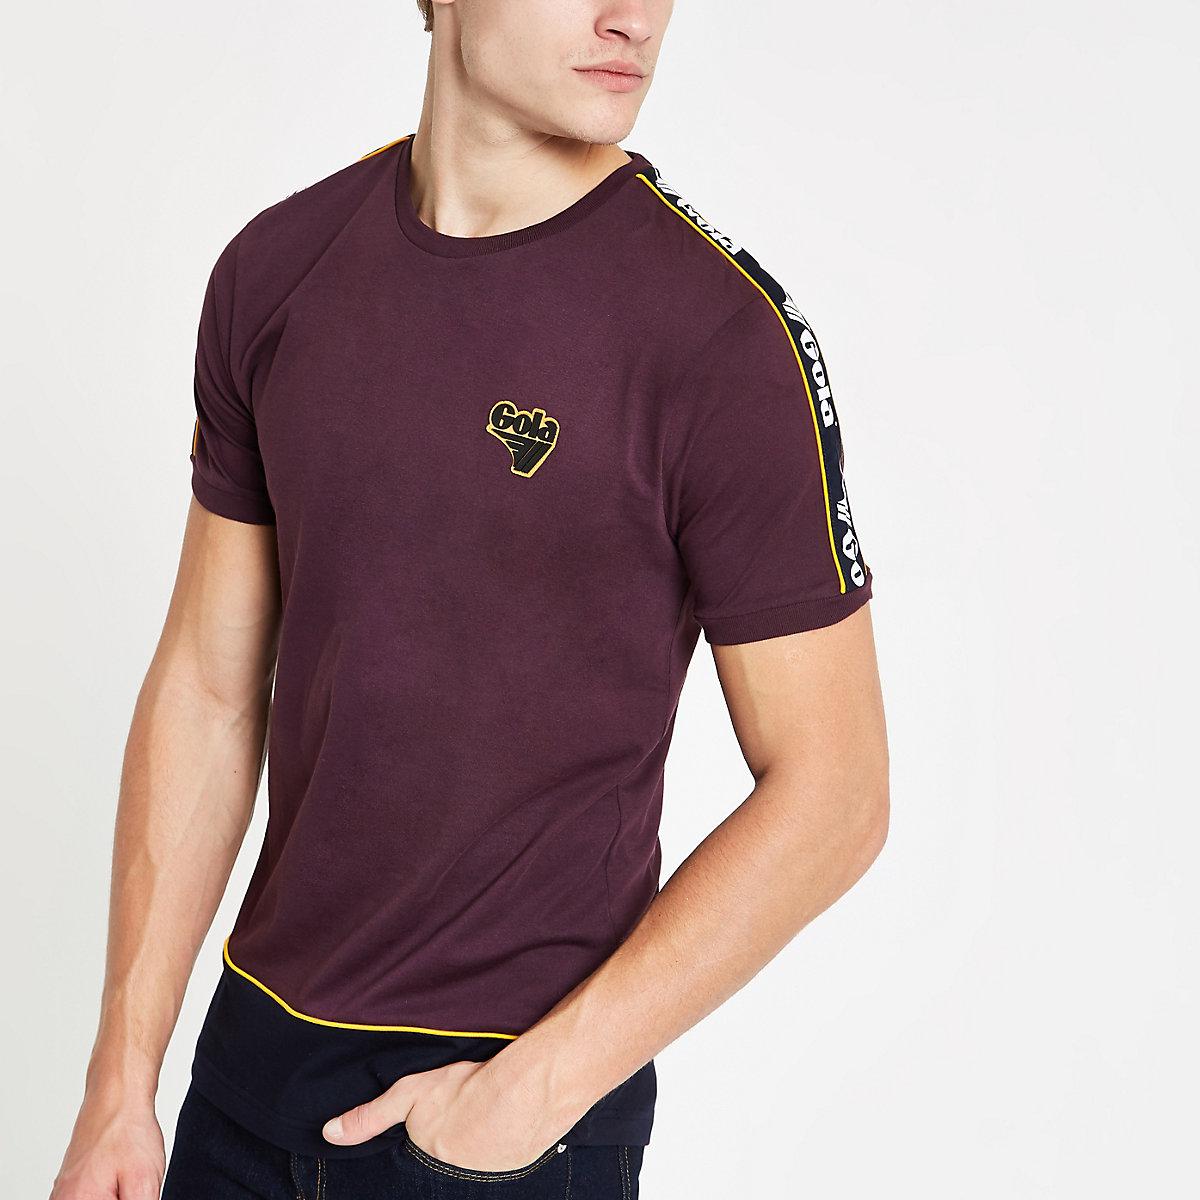 Gola burgundy tape crew neck T-shirt